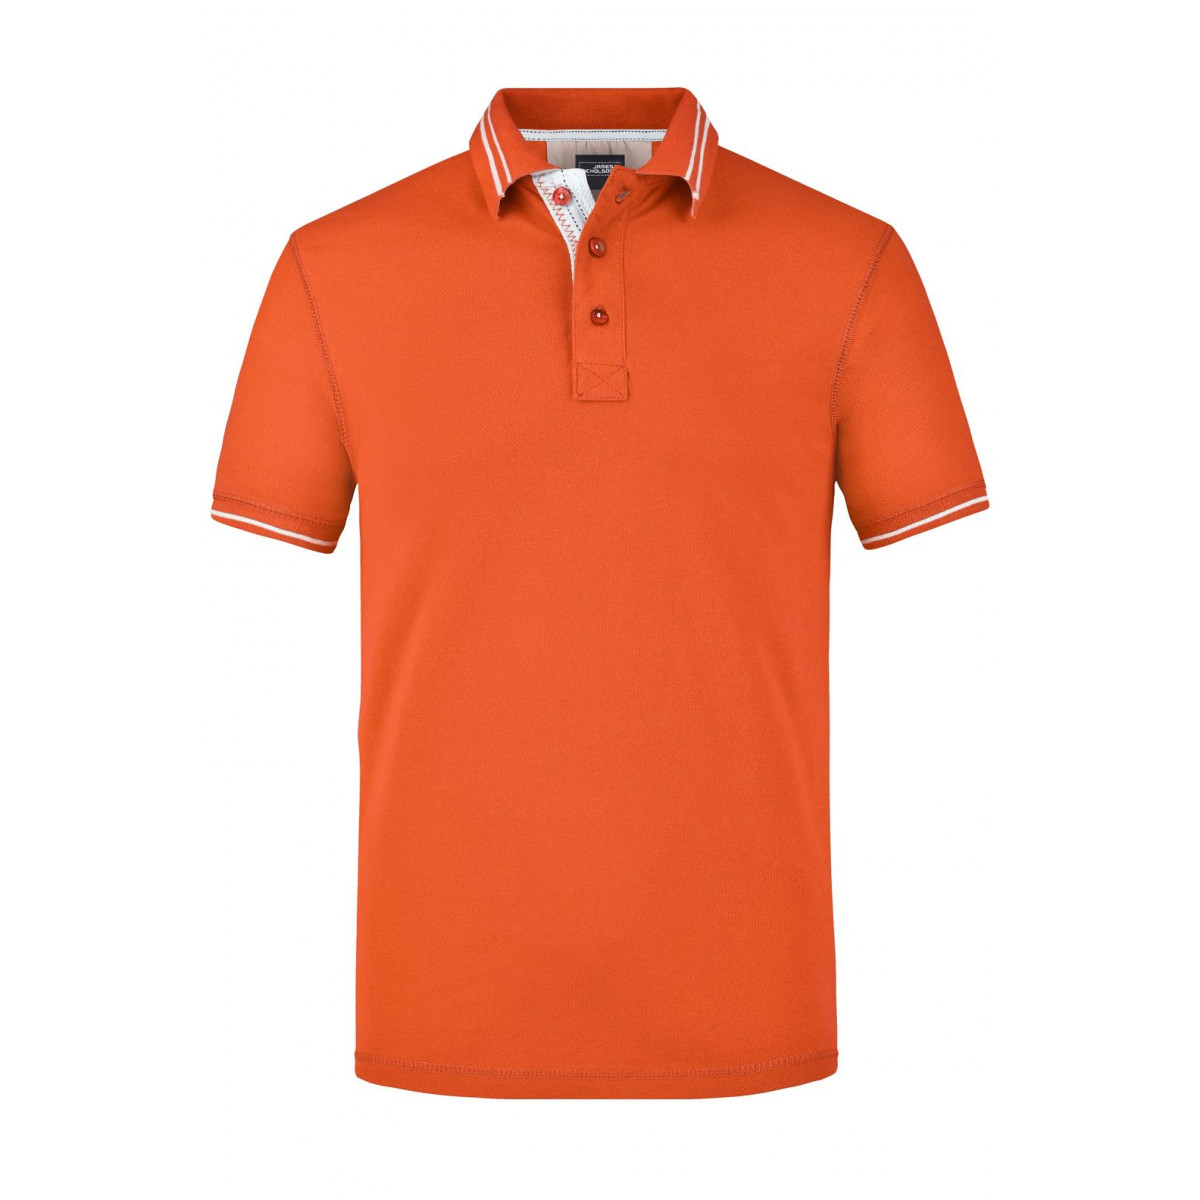 Рубашка поло мужская JN947 Mens Lifestyle Polo - Темно-оранжевый/Белый